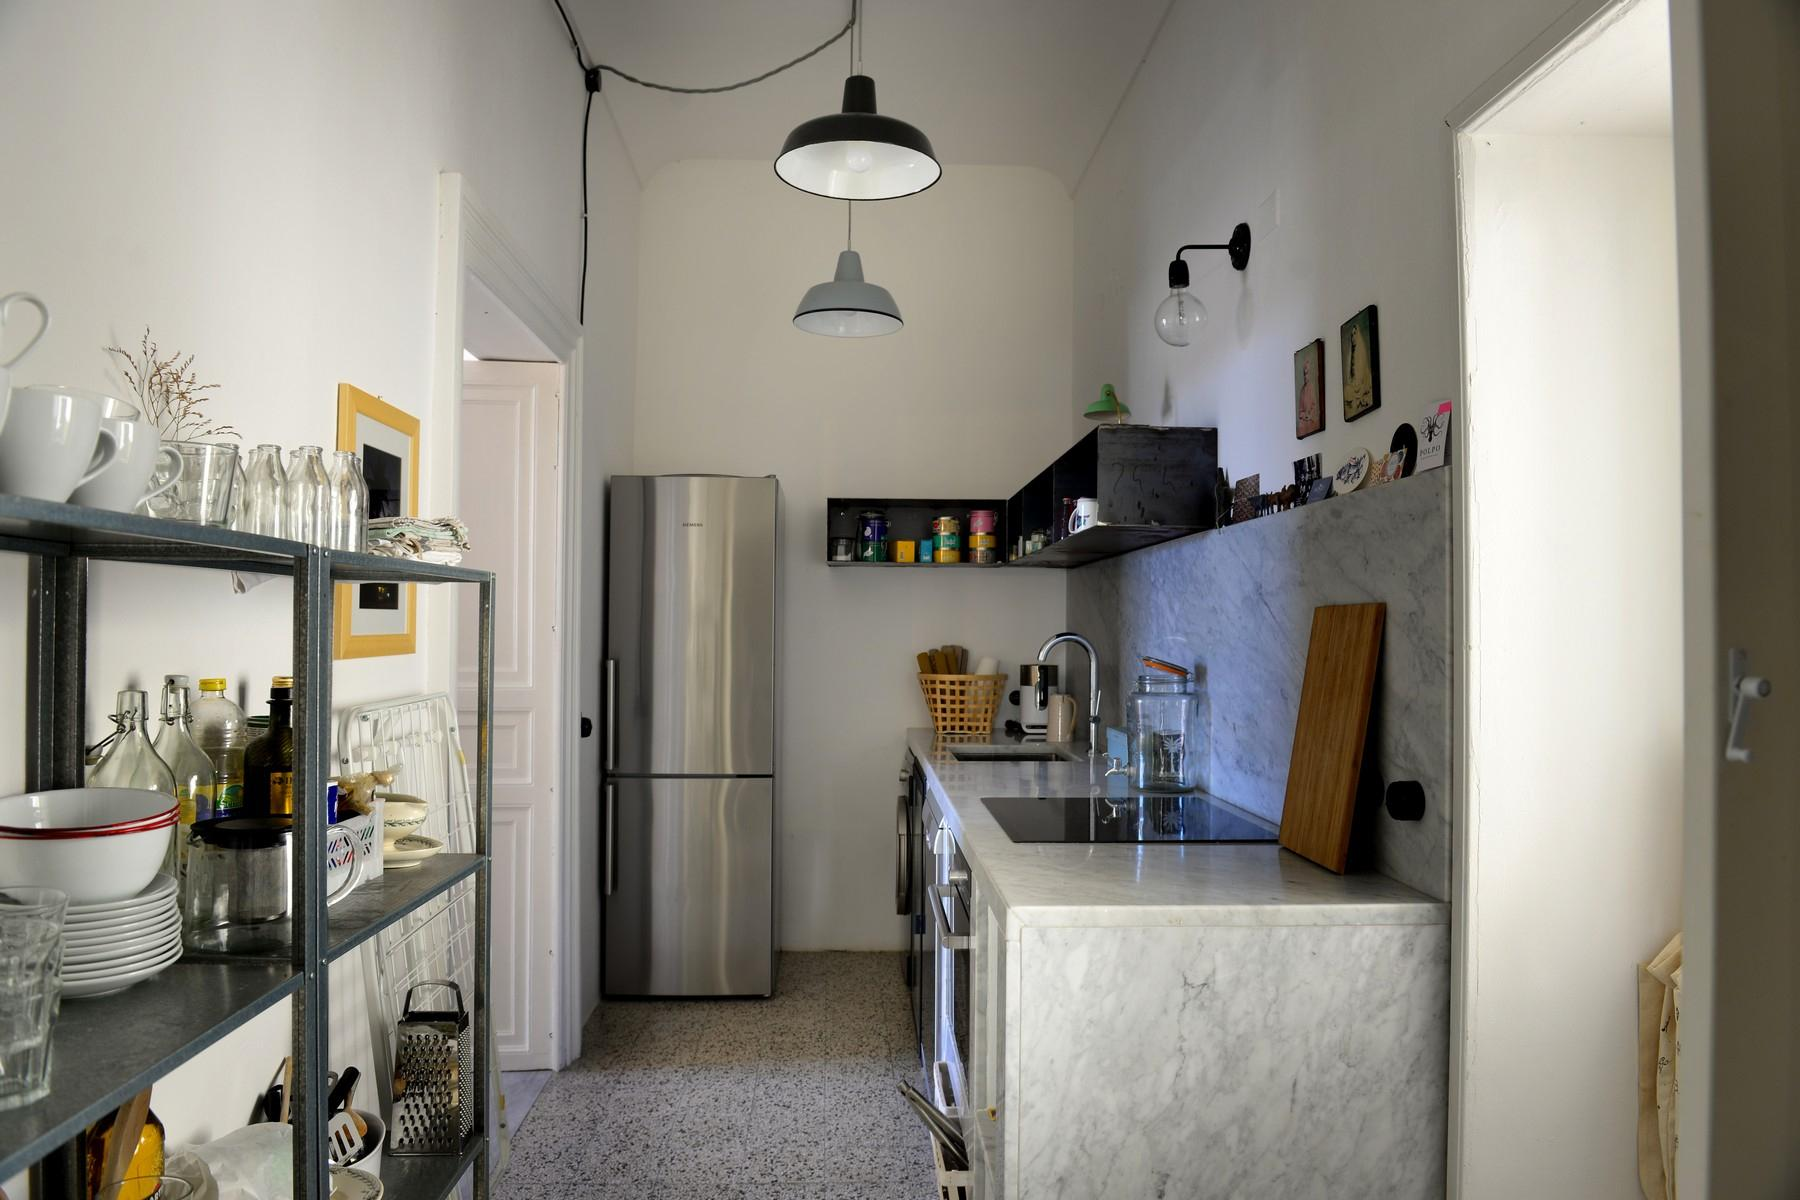 Noto铺设着原始地板的公寓 - 4